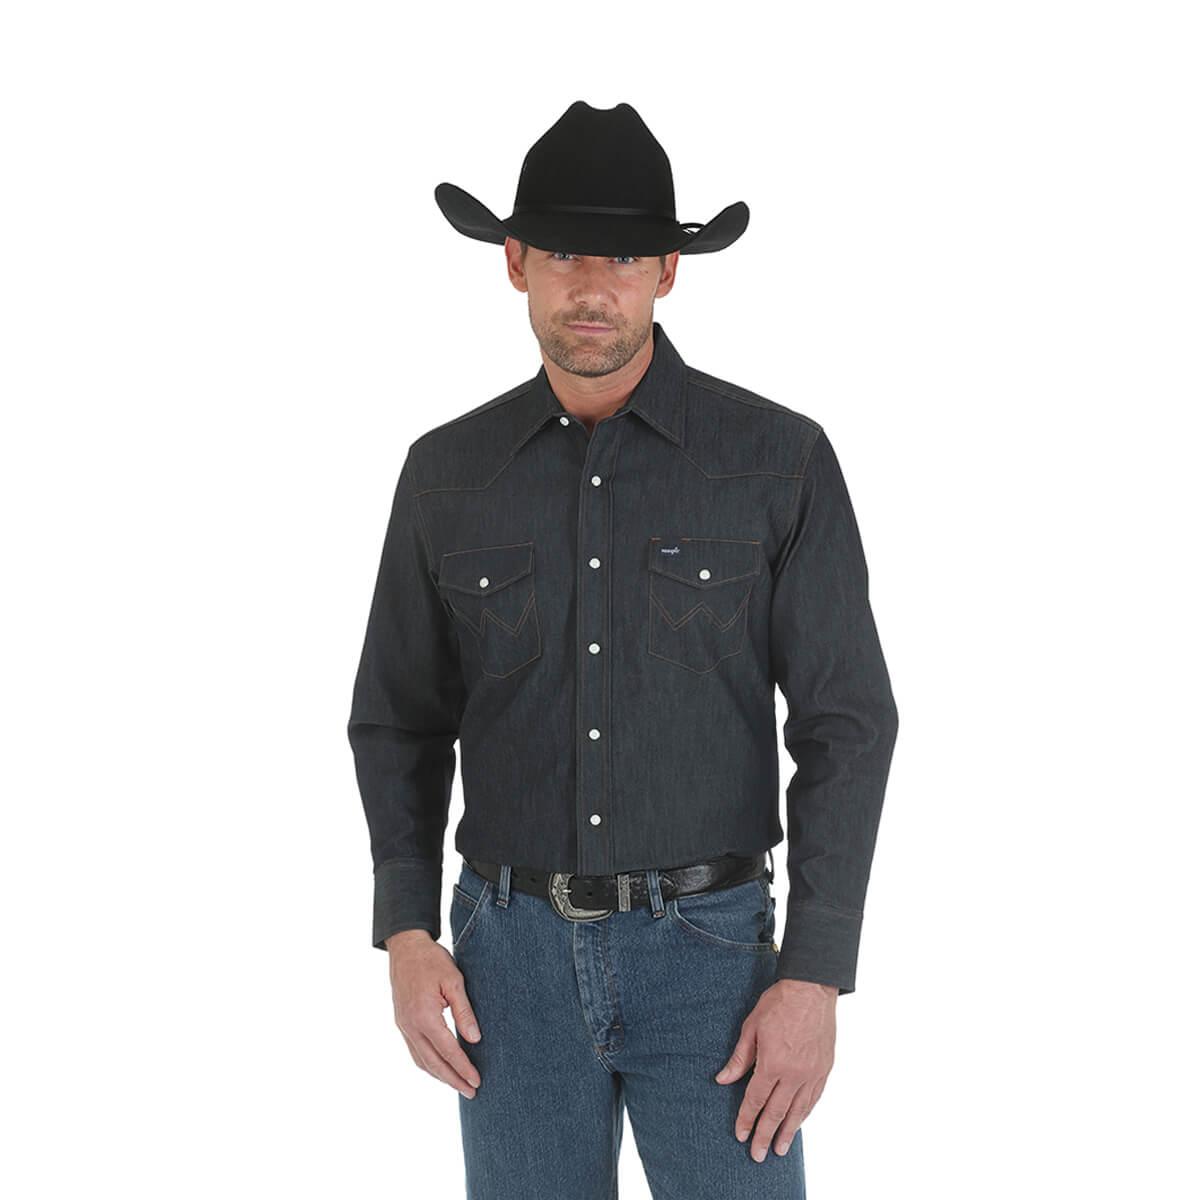 Men's Wrangler® Premium Performance Advanced Comfort Cowboy-Cut Long-Sleeved Shirt - Denim